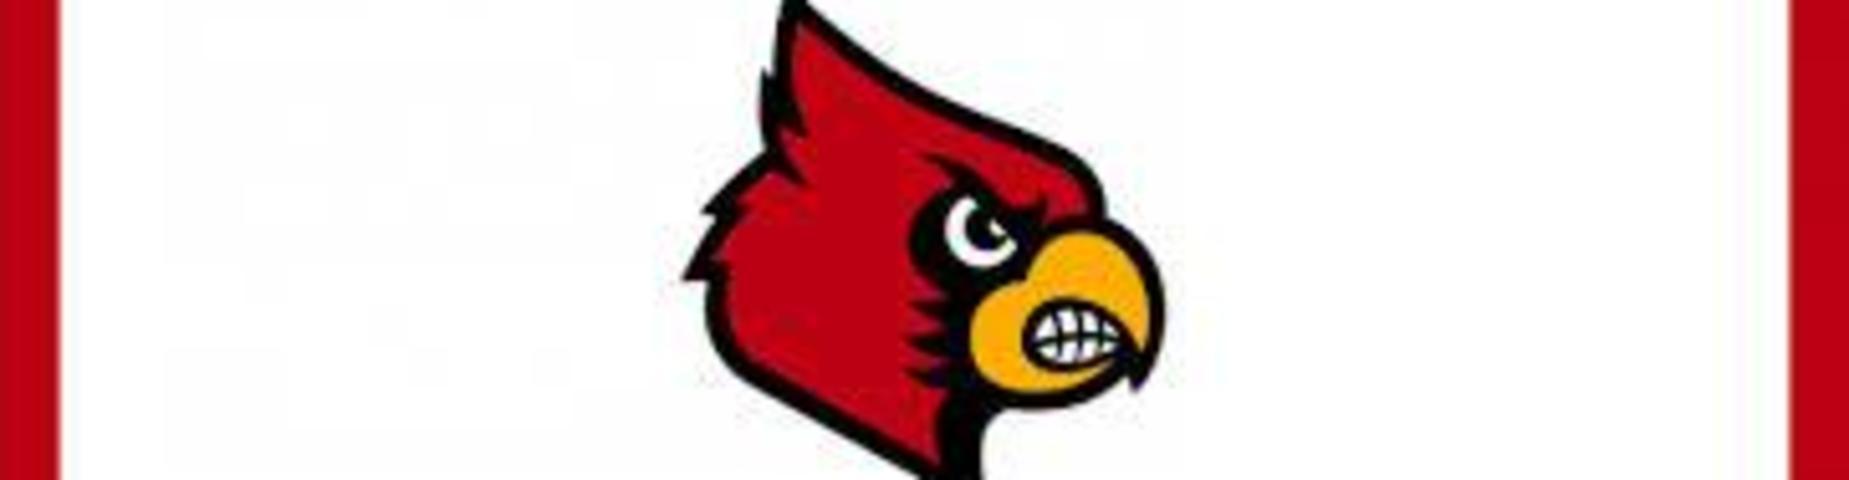 Cardinal Head Image